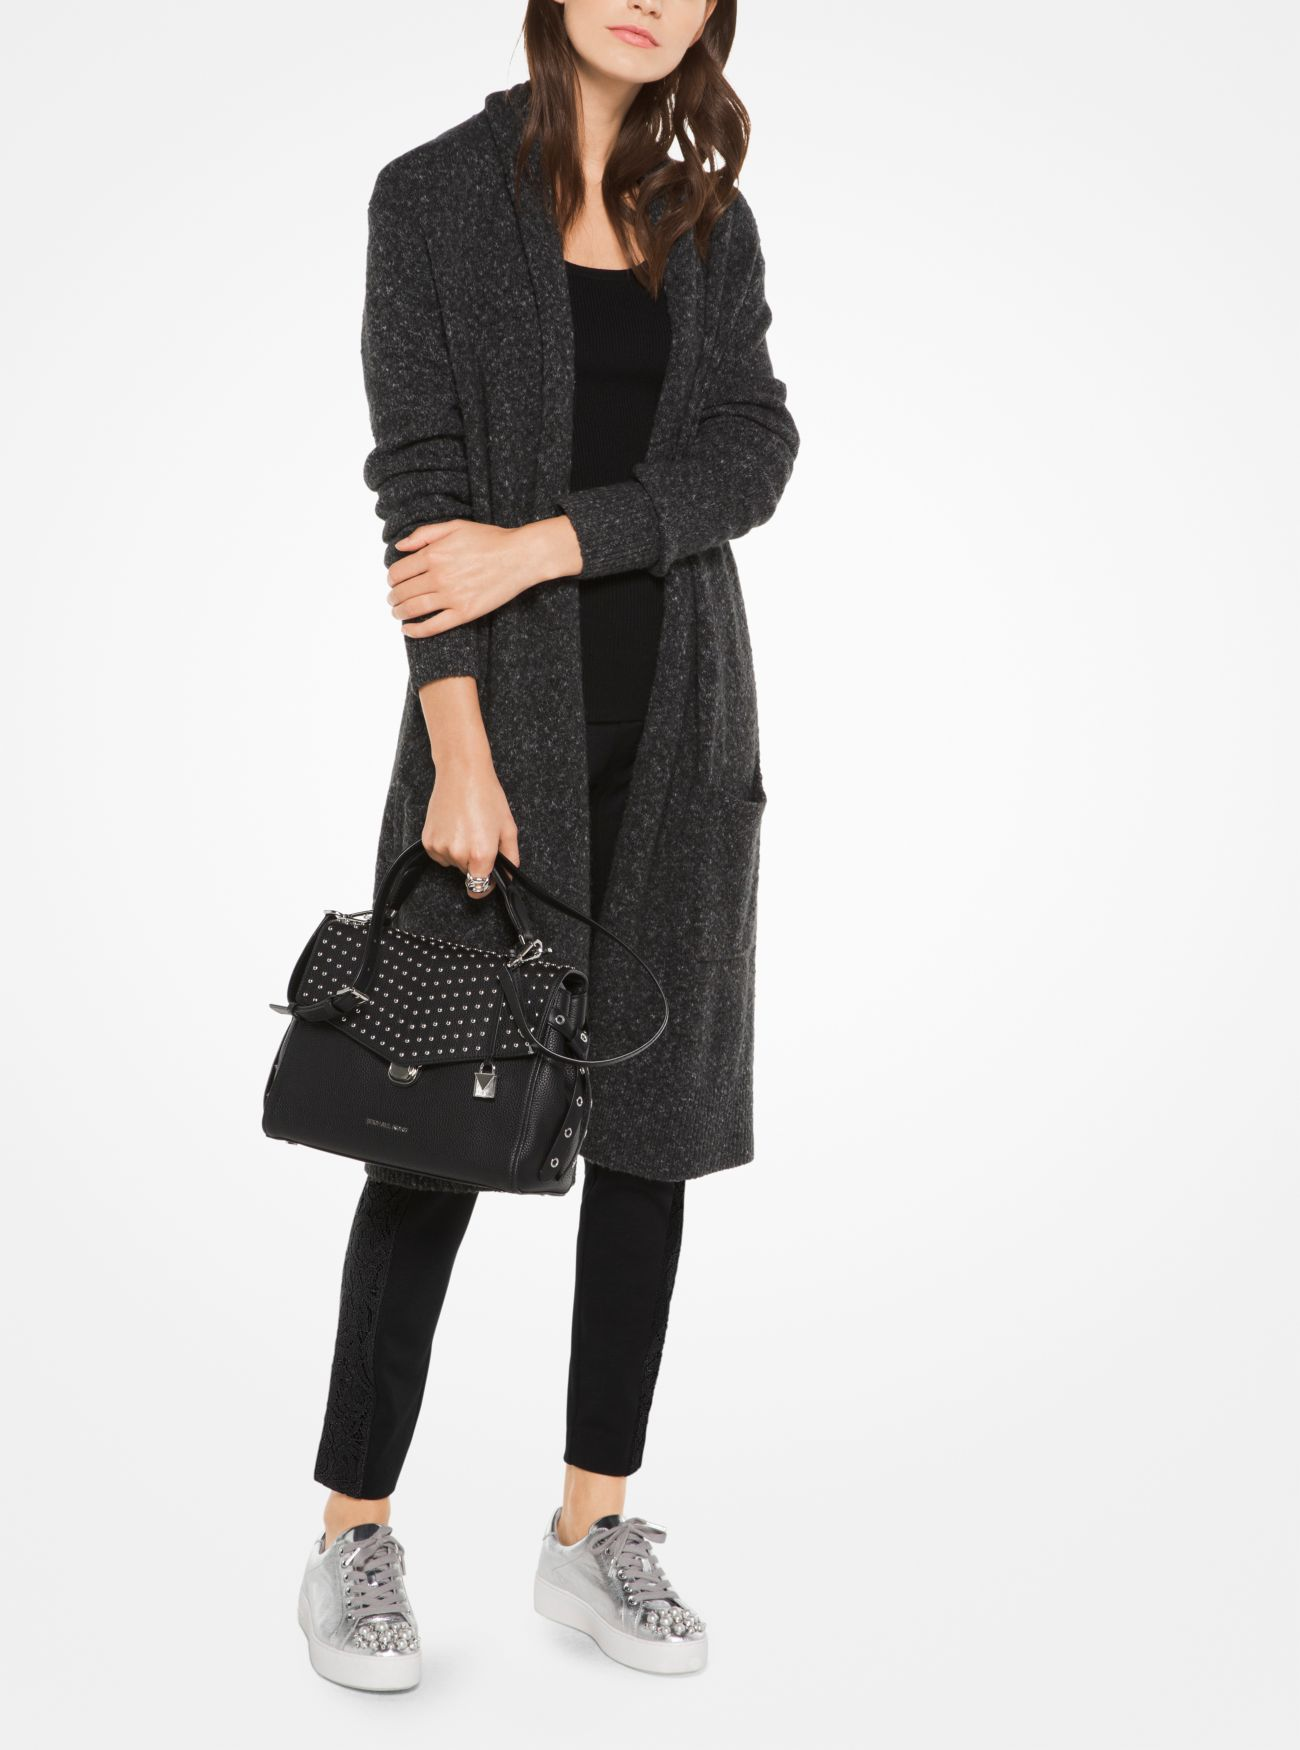 Sweaters & Cardigans | Women's Clothing | Michael Kors